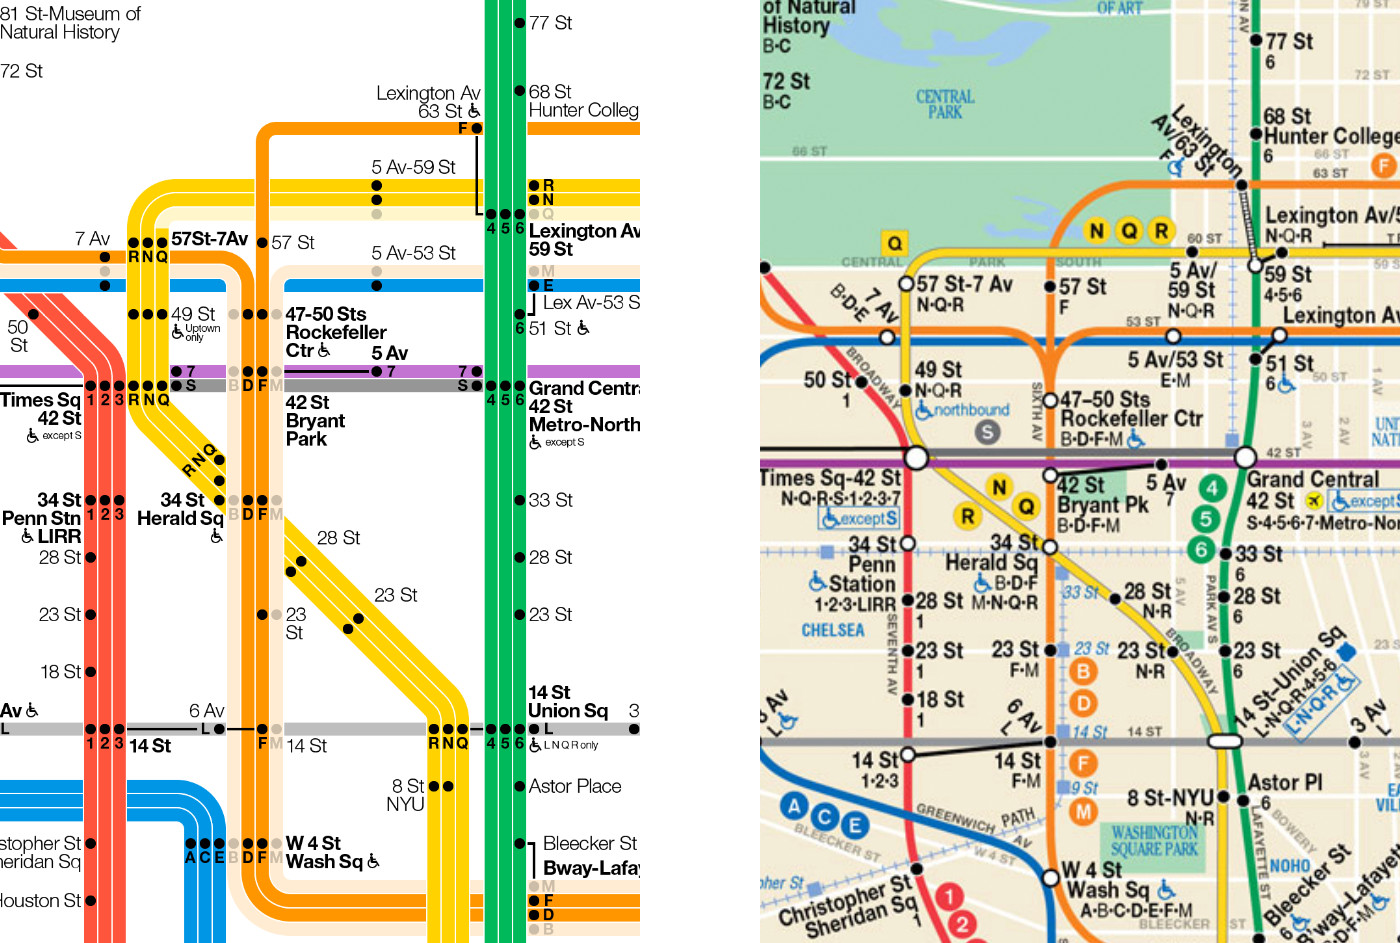 Current maps